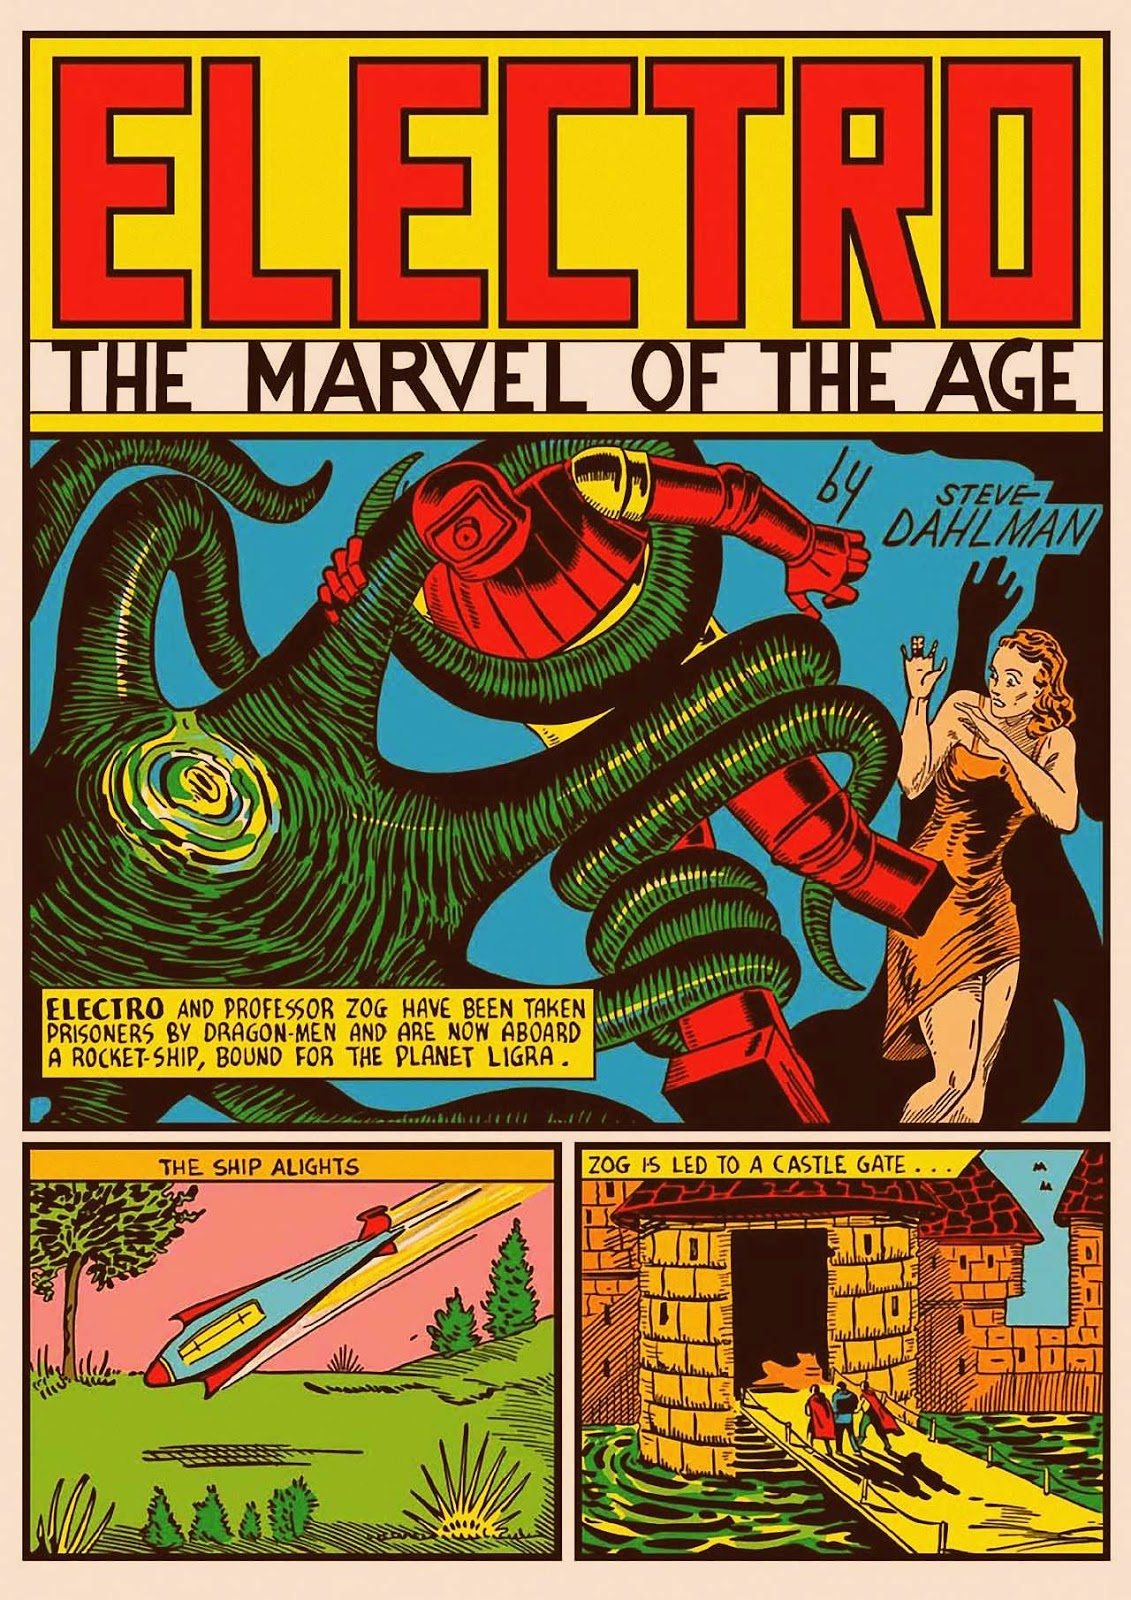 Marvel Mystery Comics no. 9-ontheplanetLigra